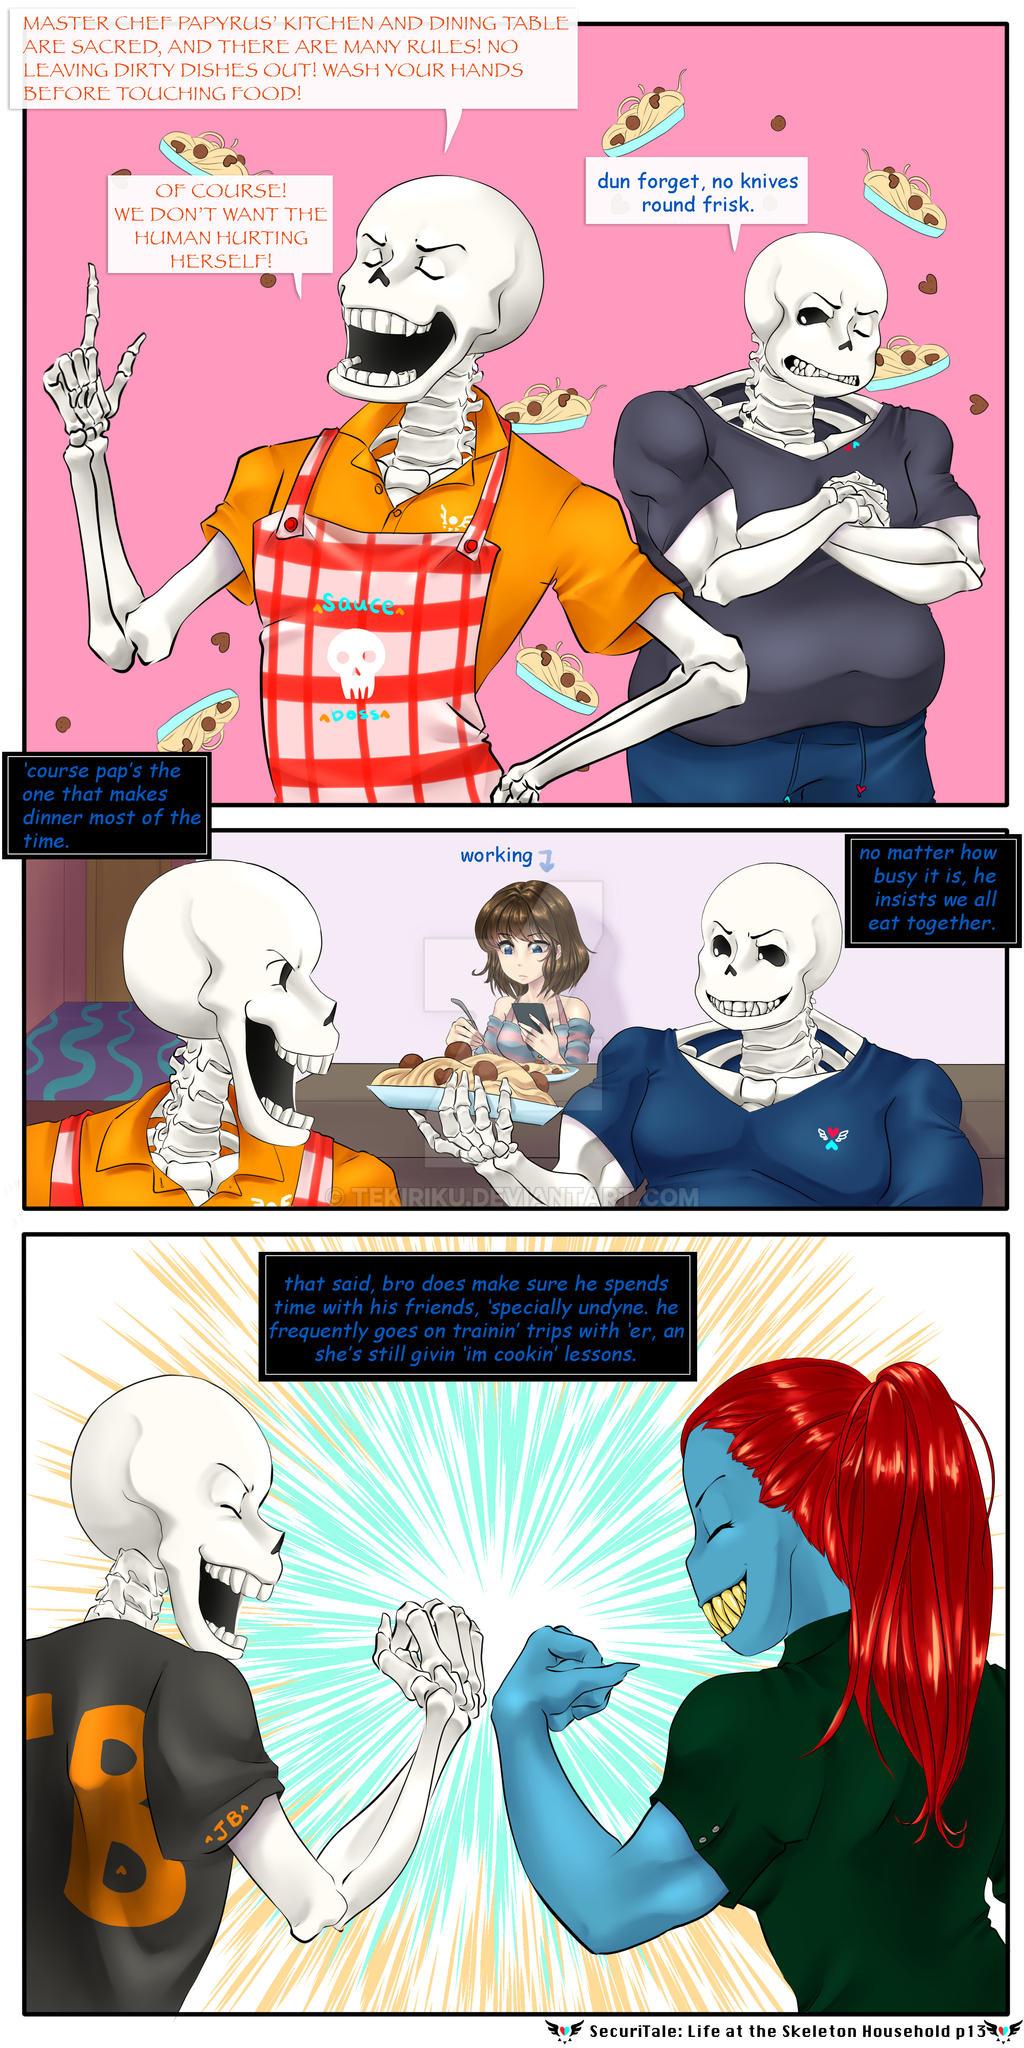 SecuriTale: Life at the Skeleton Household 13 by tekitourabbit